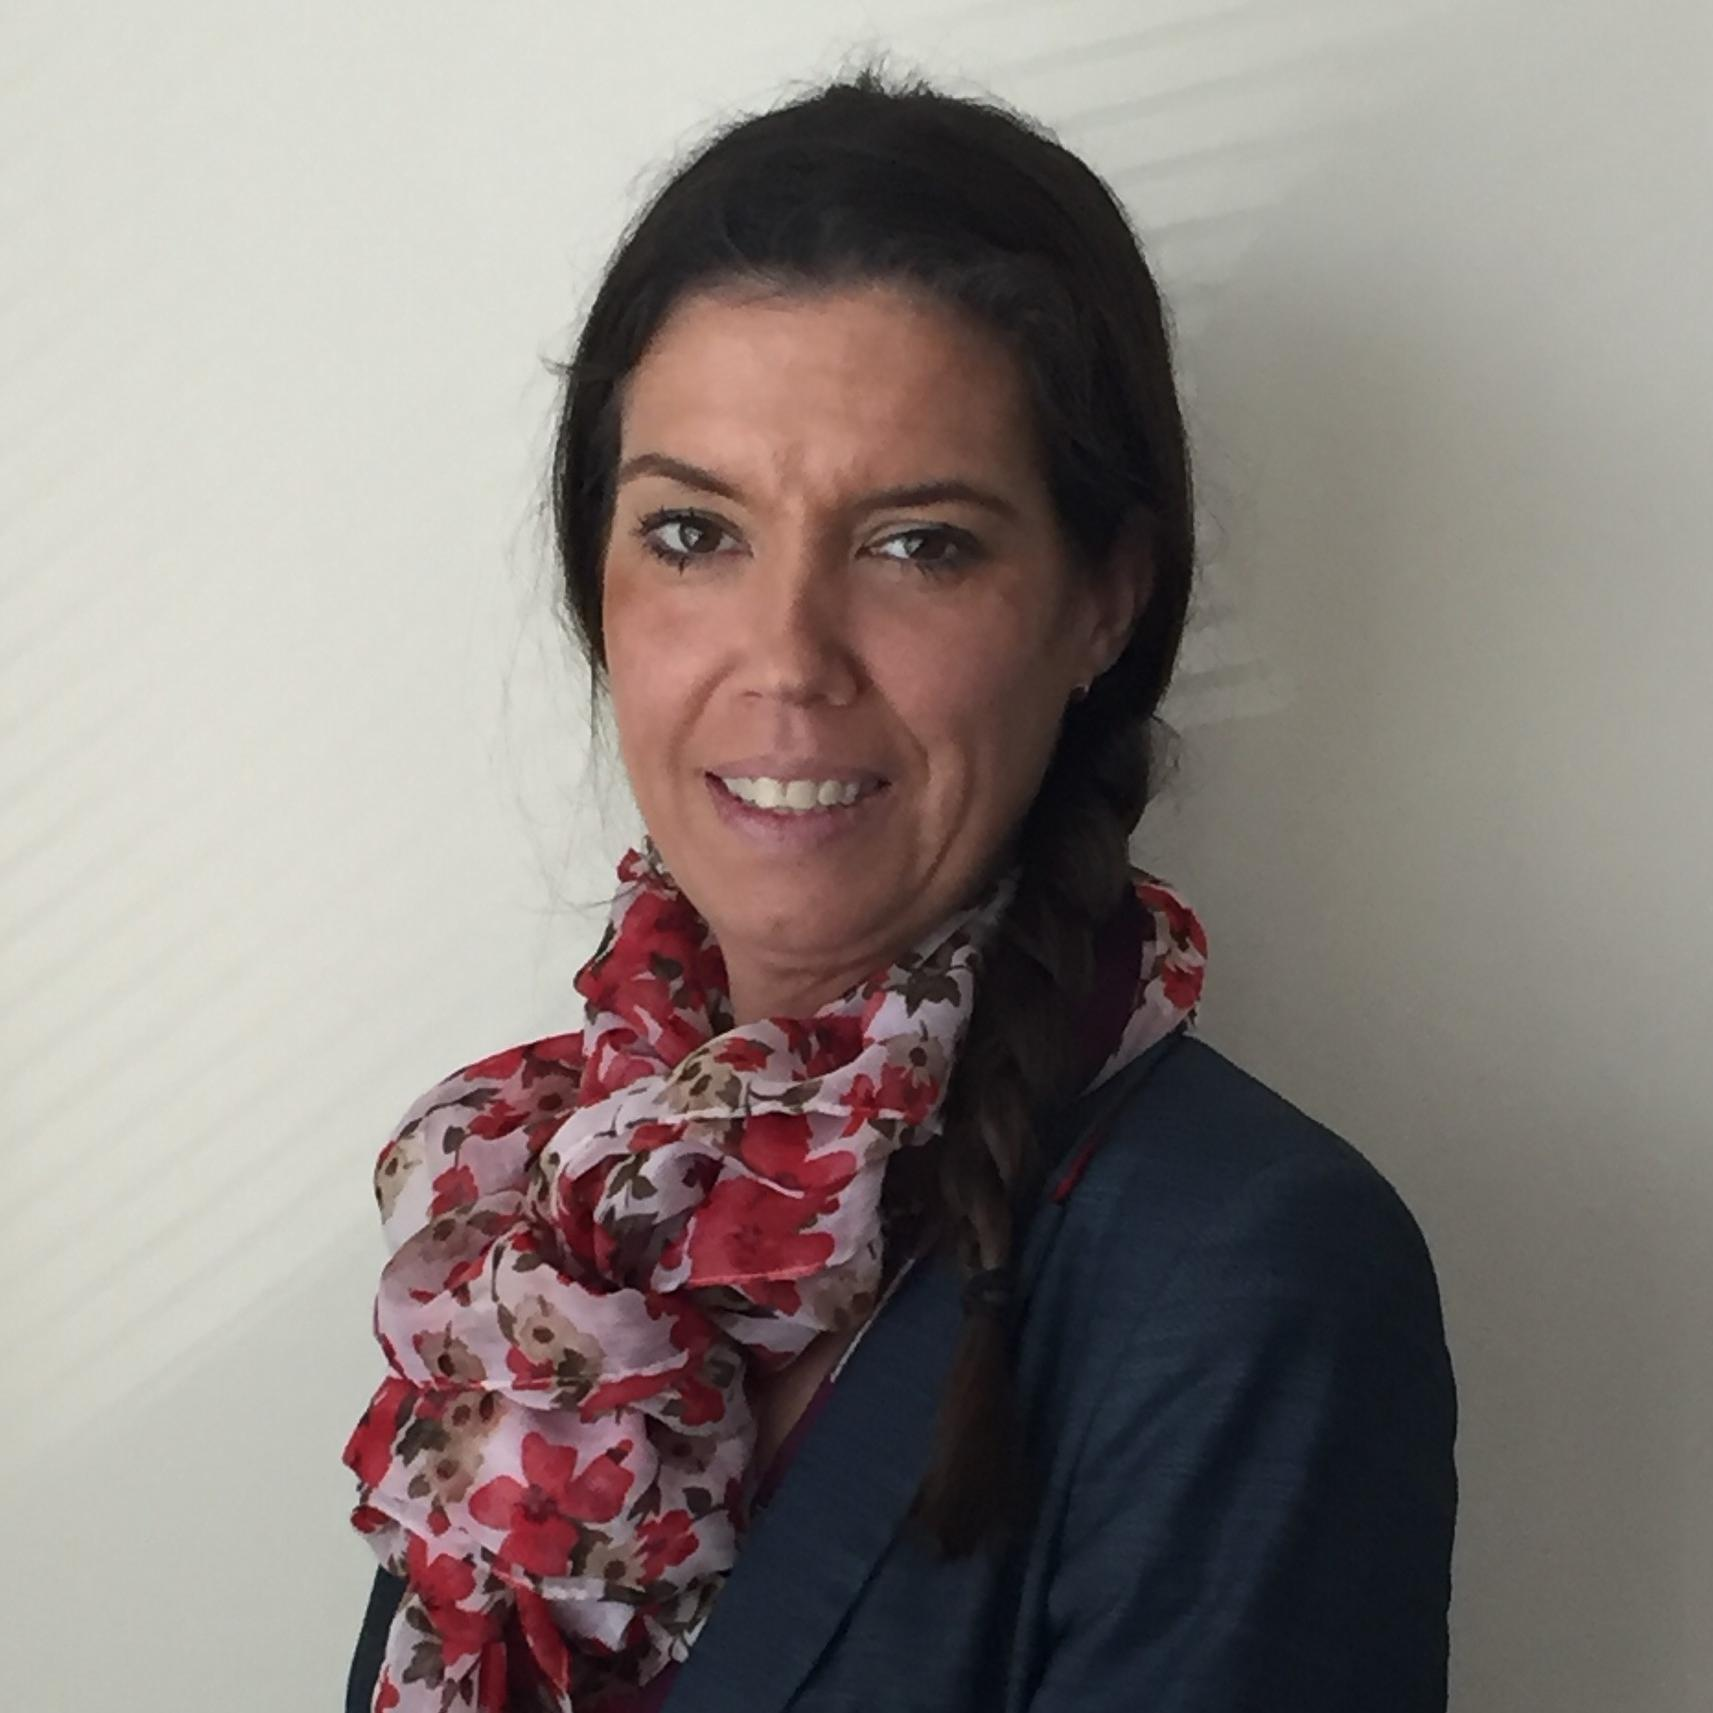 Marketing Manager- Marie Franks